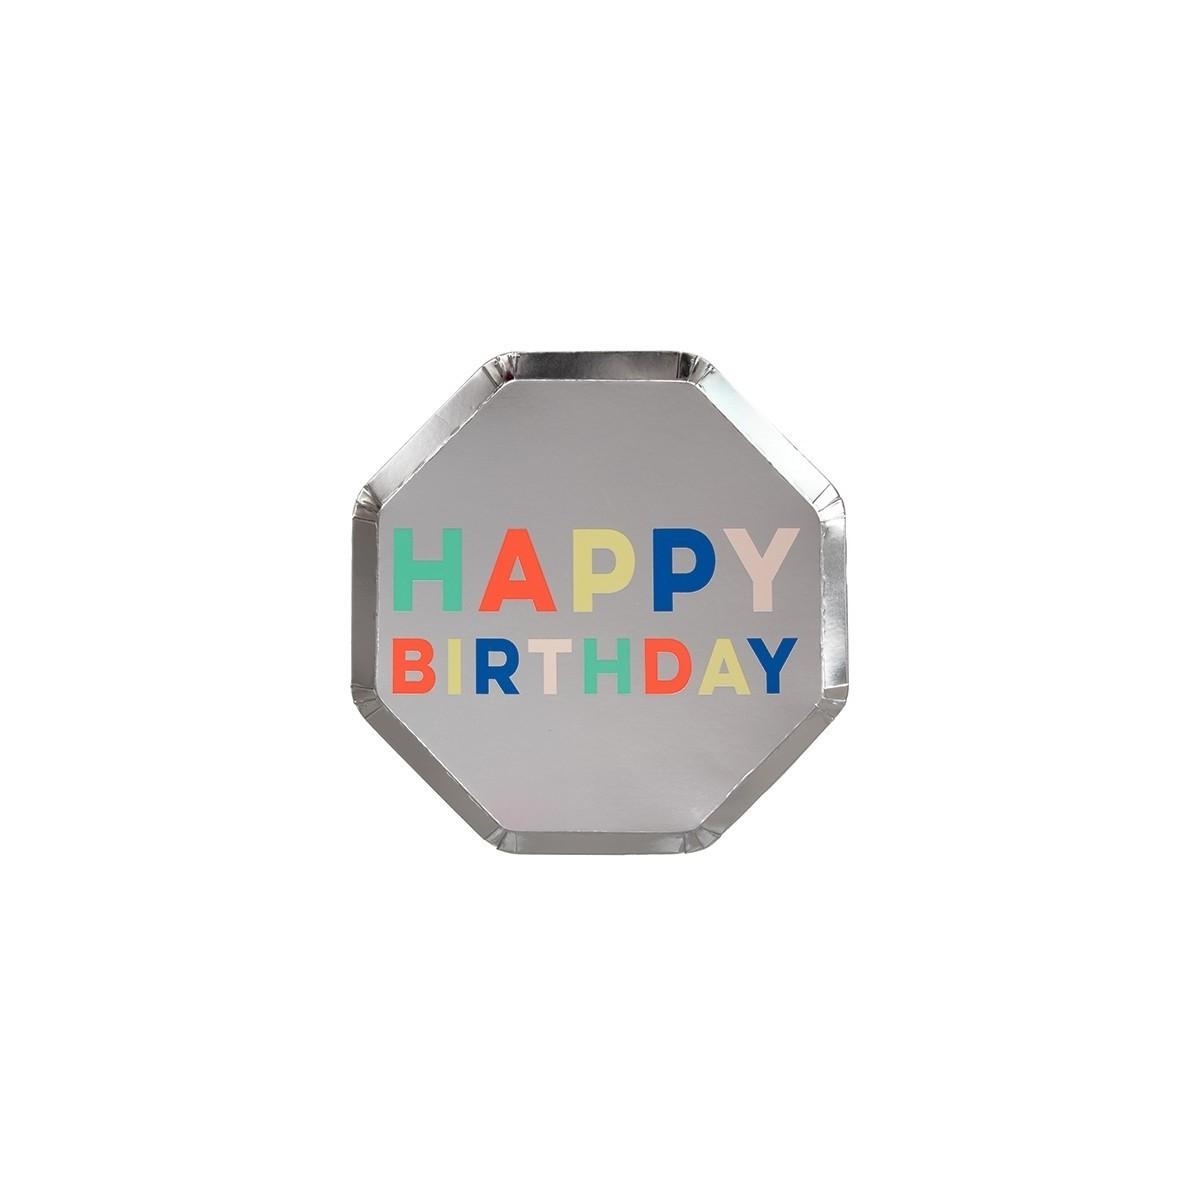 Petites assiettes argentée happy birthday